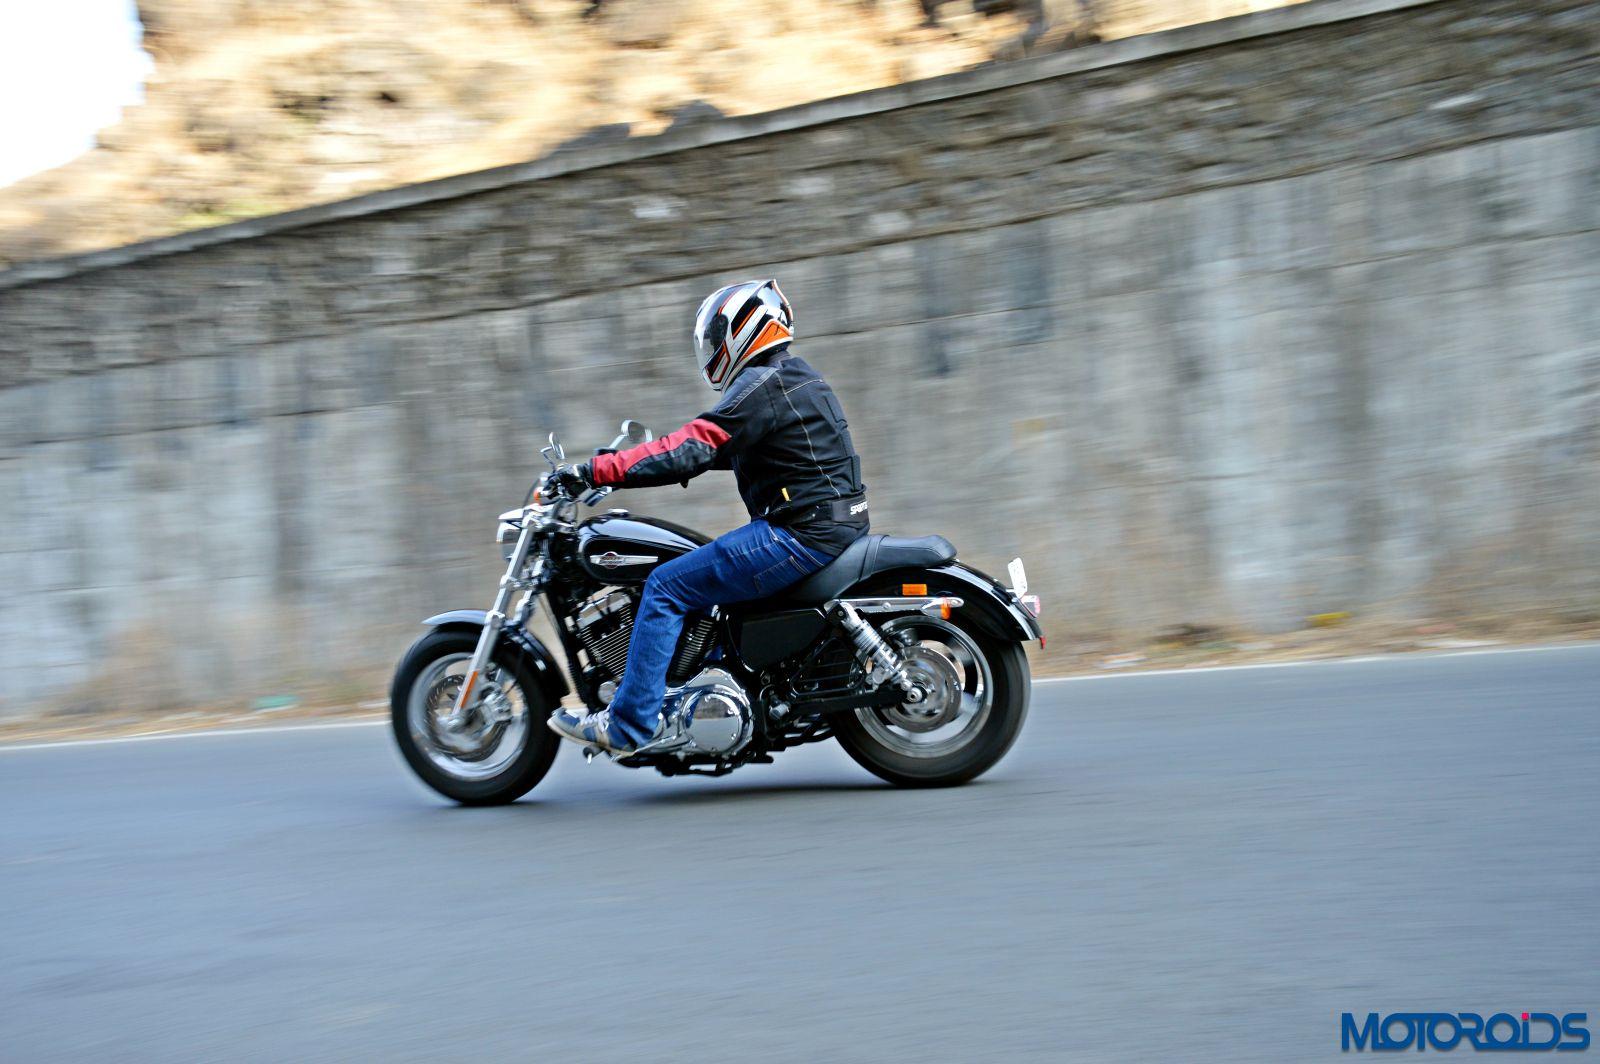 Harley-Davidson 1200 Custom Review - Action Shots (5)